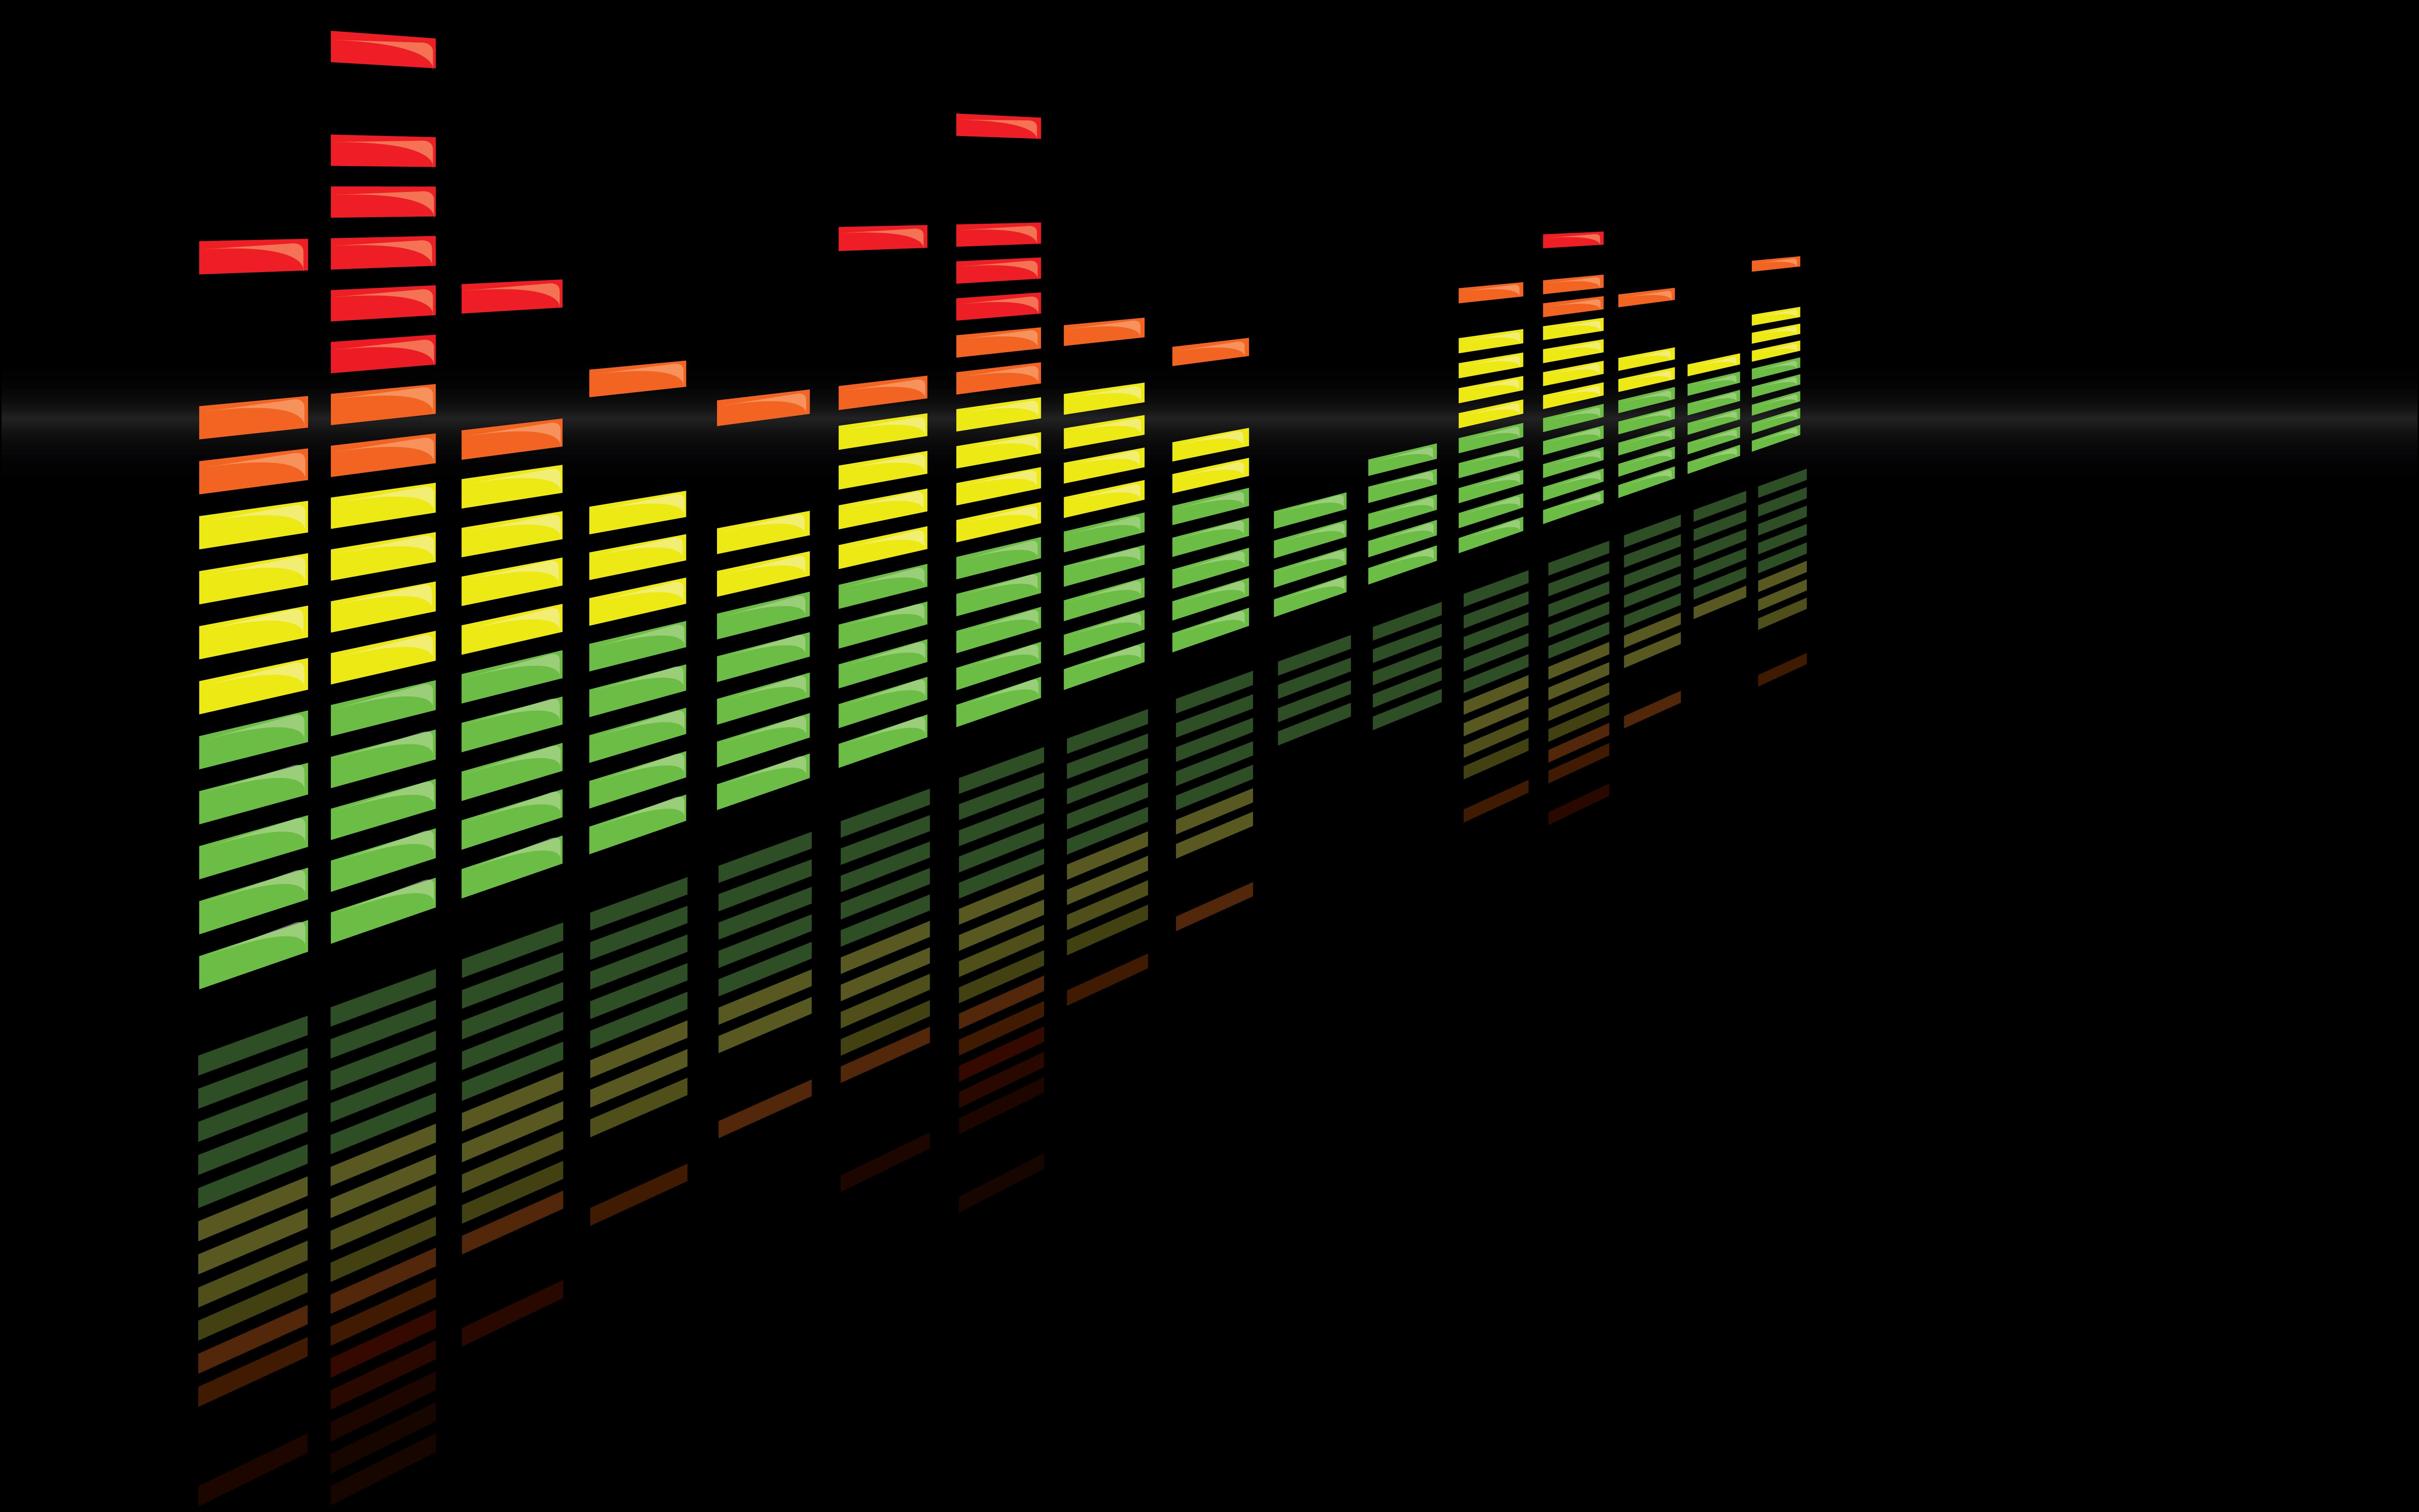 Download Dj Music Wallpapers Hd Music Desktop Backgrounds Follow Us